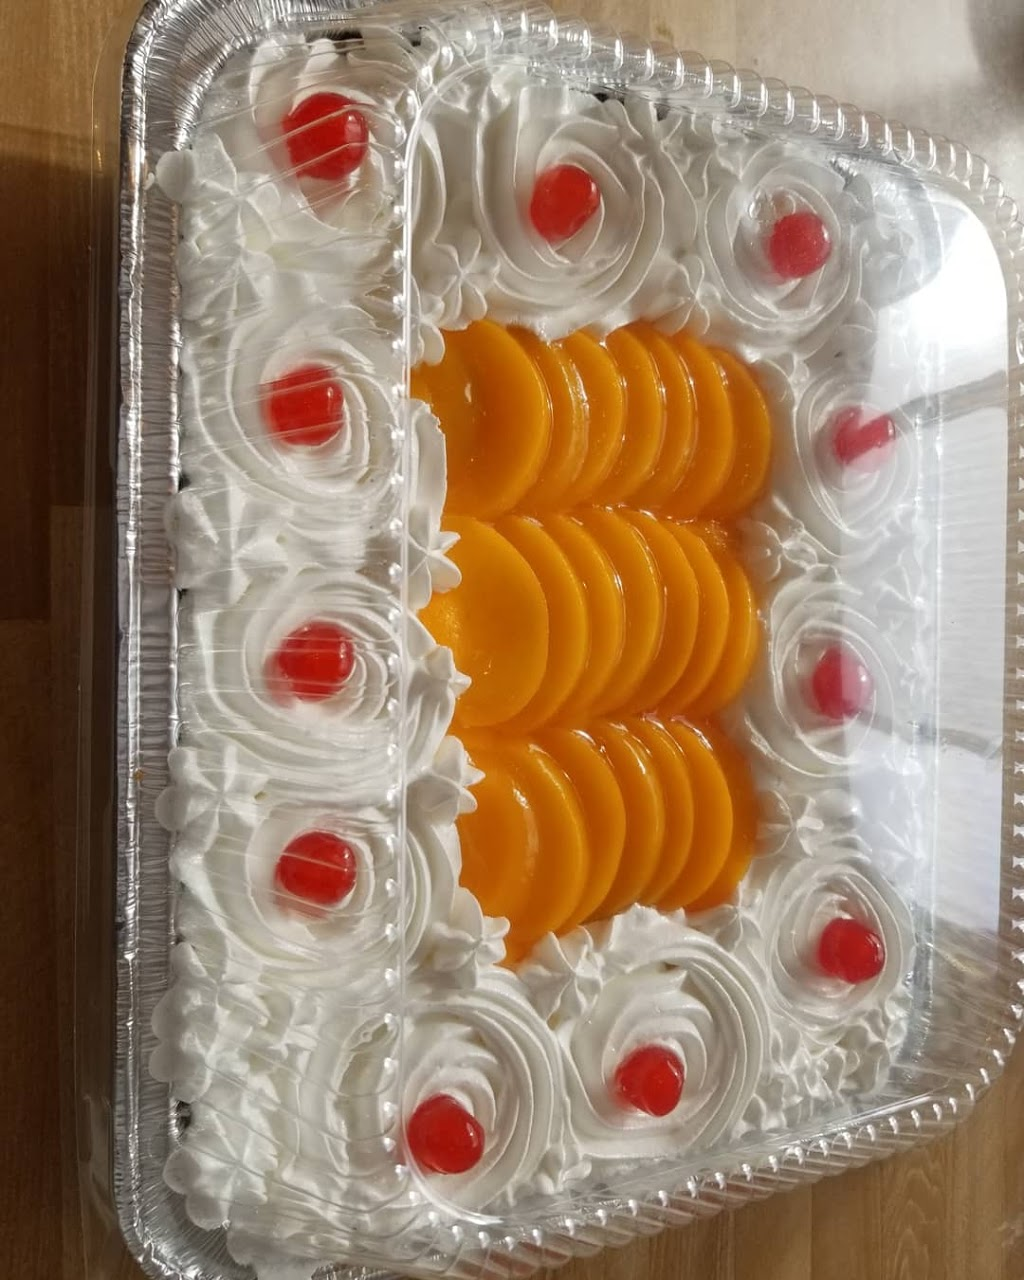 Cake Bakery Bro | point of interest | 2 Montée Saint-Hubert #3925, Saint-Hubert, QC J3Y 4K2, Canada | 5142475256 OR +1 514-247-5256